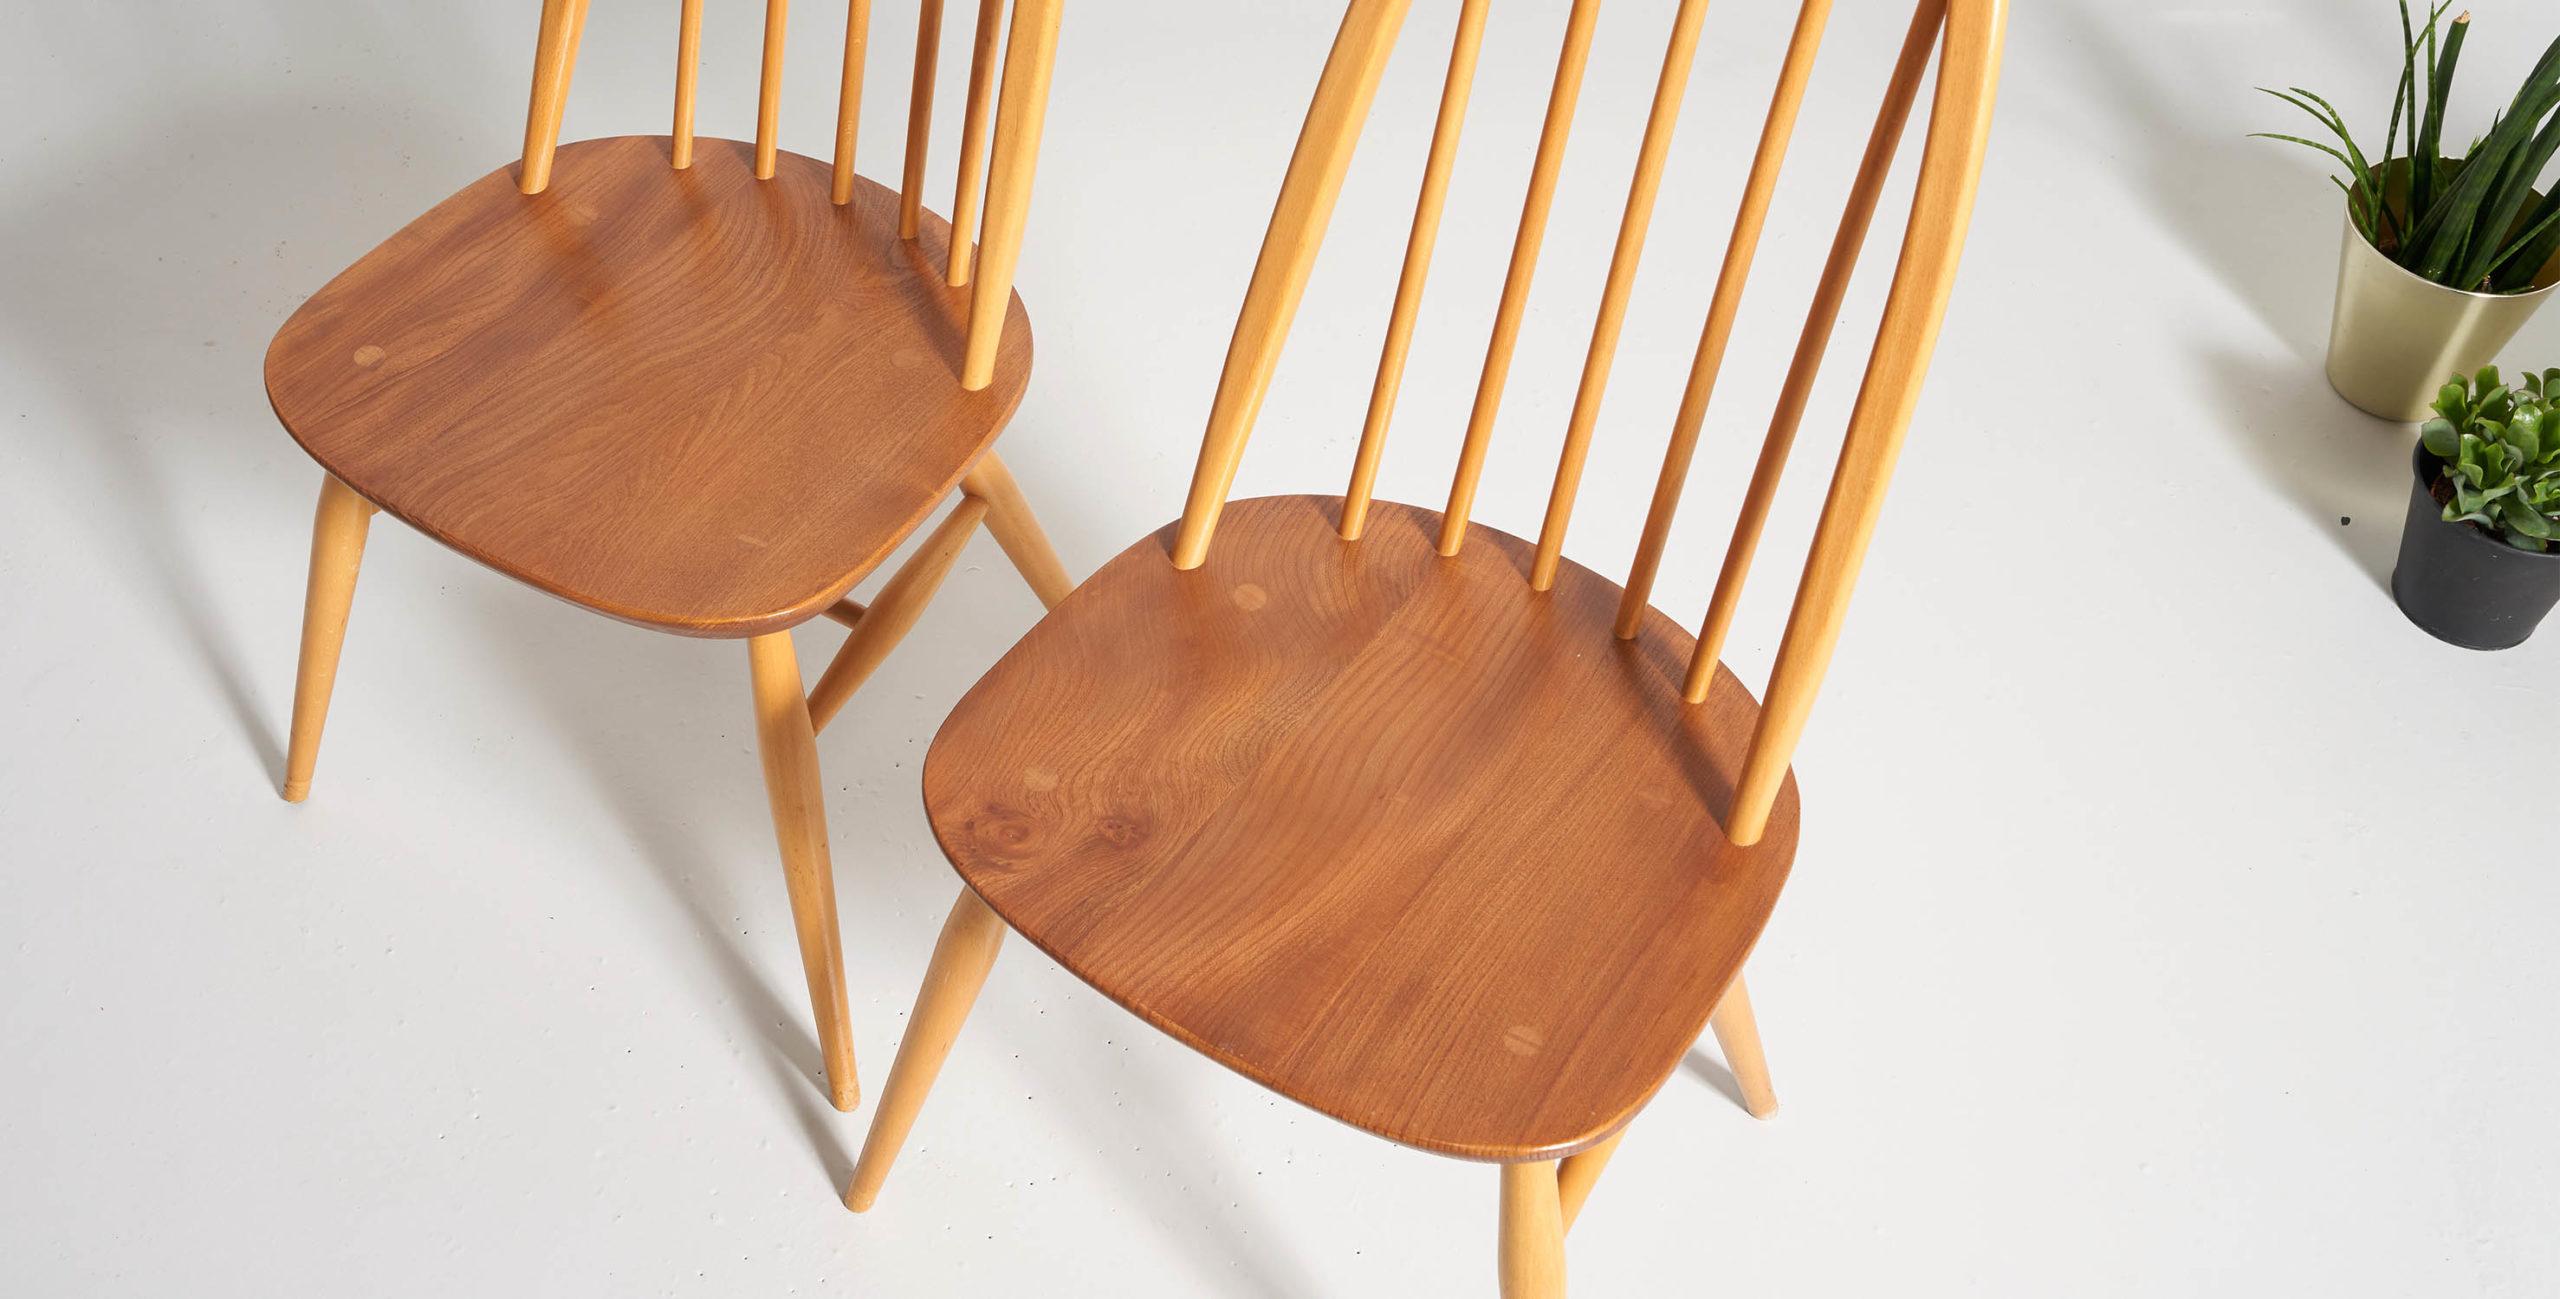 ercol, chaise ercol, chaise ercol, ercol quaker, chaise ercol quaker, ercol vintage, chaise ercol vintage, chaise à barreaux vintage, ercol ton clair, chaise ercol bois clair, chaise ercol bois blond